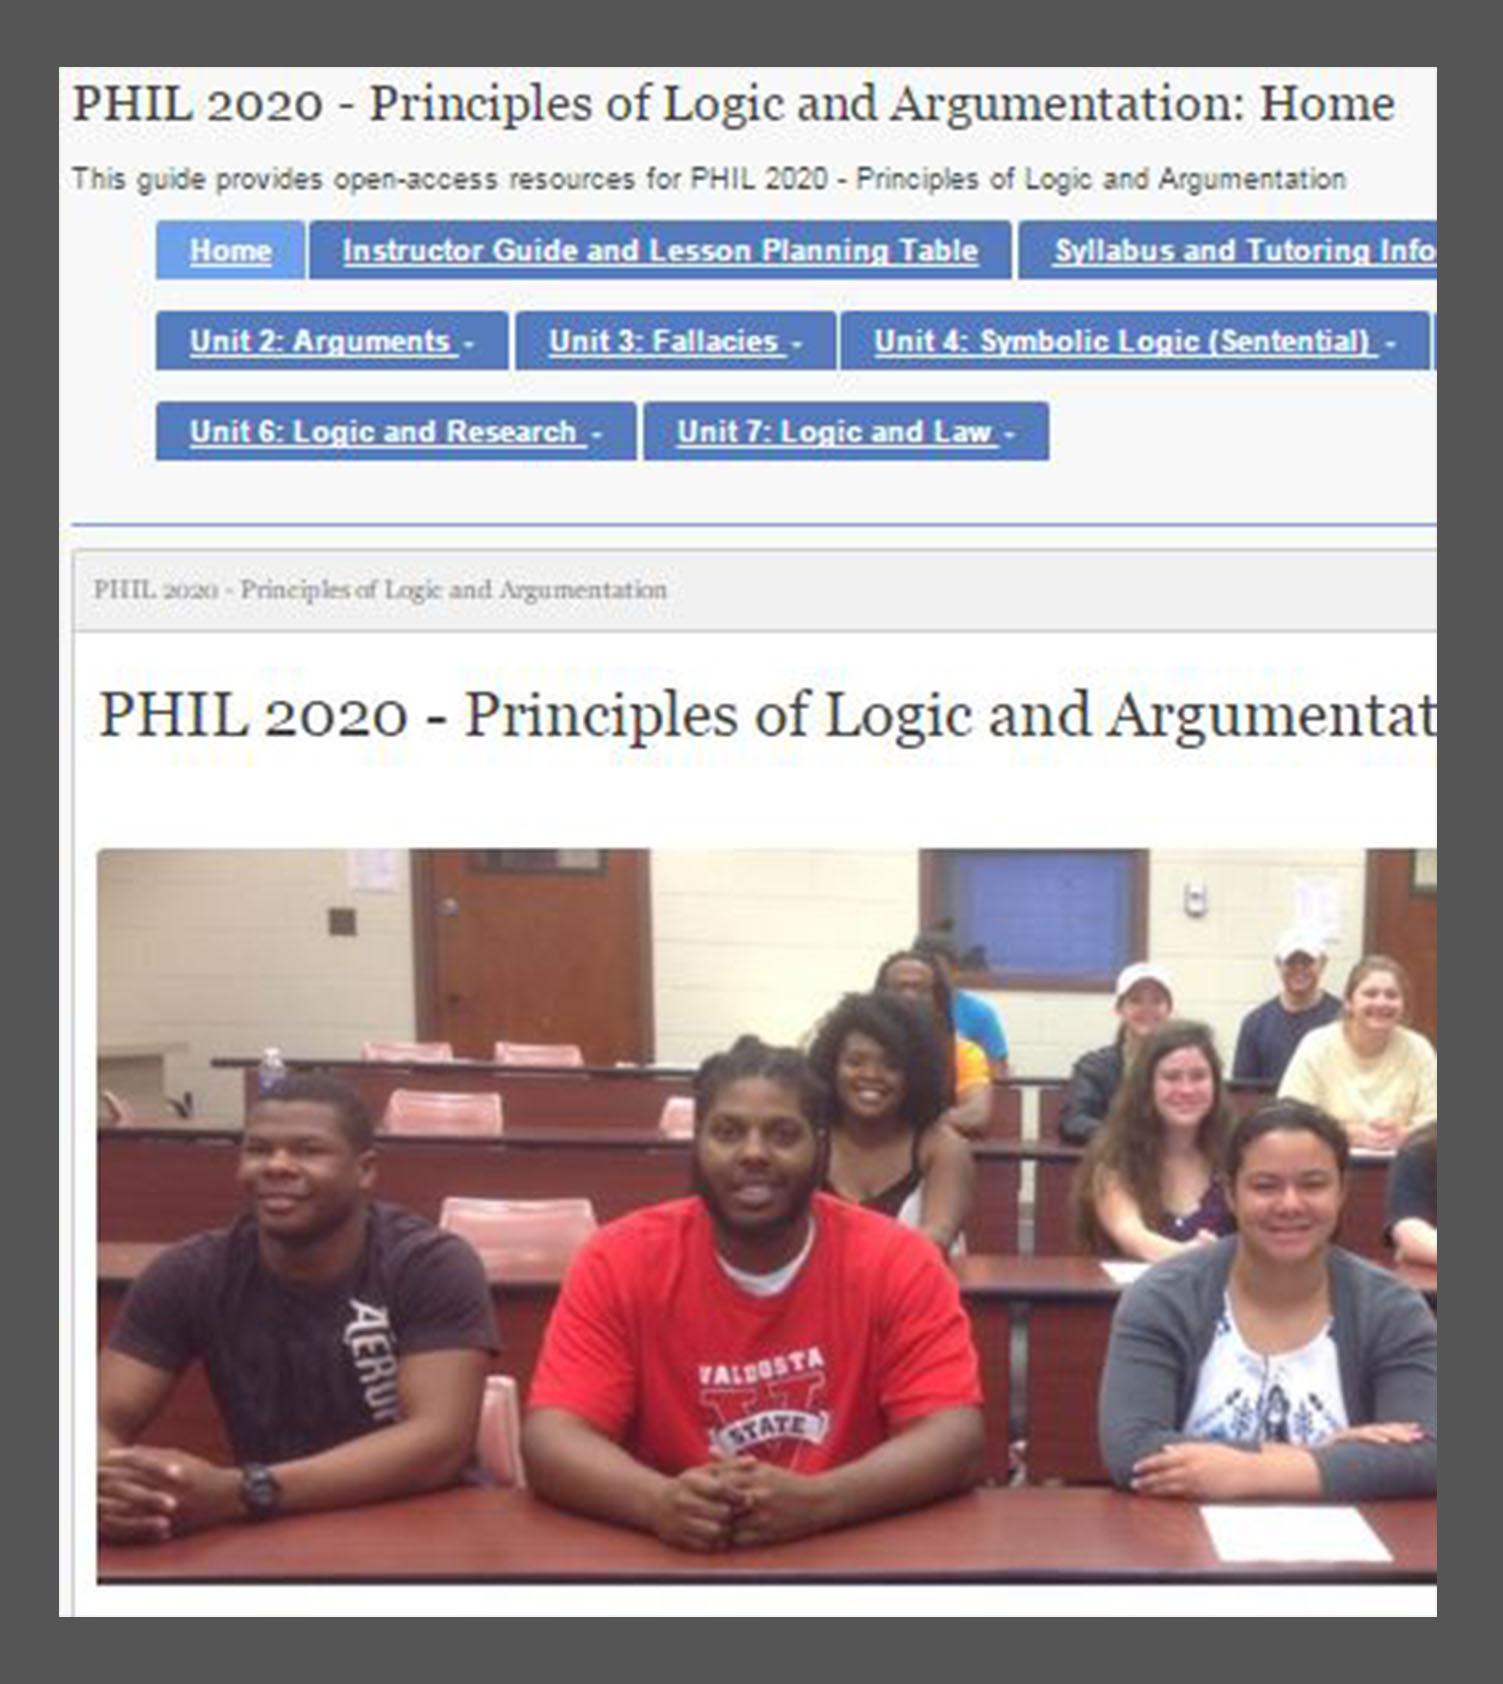 Image of book titled Principles of Logic and Argumentation